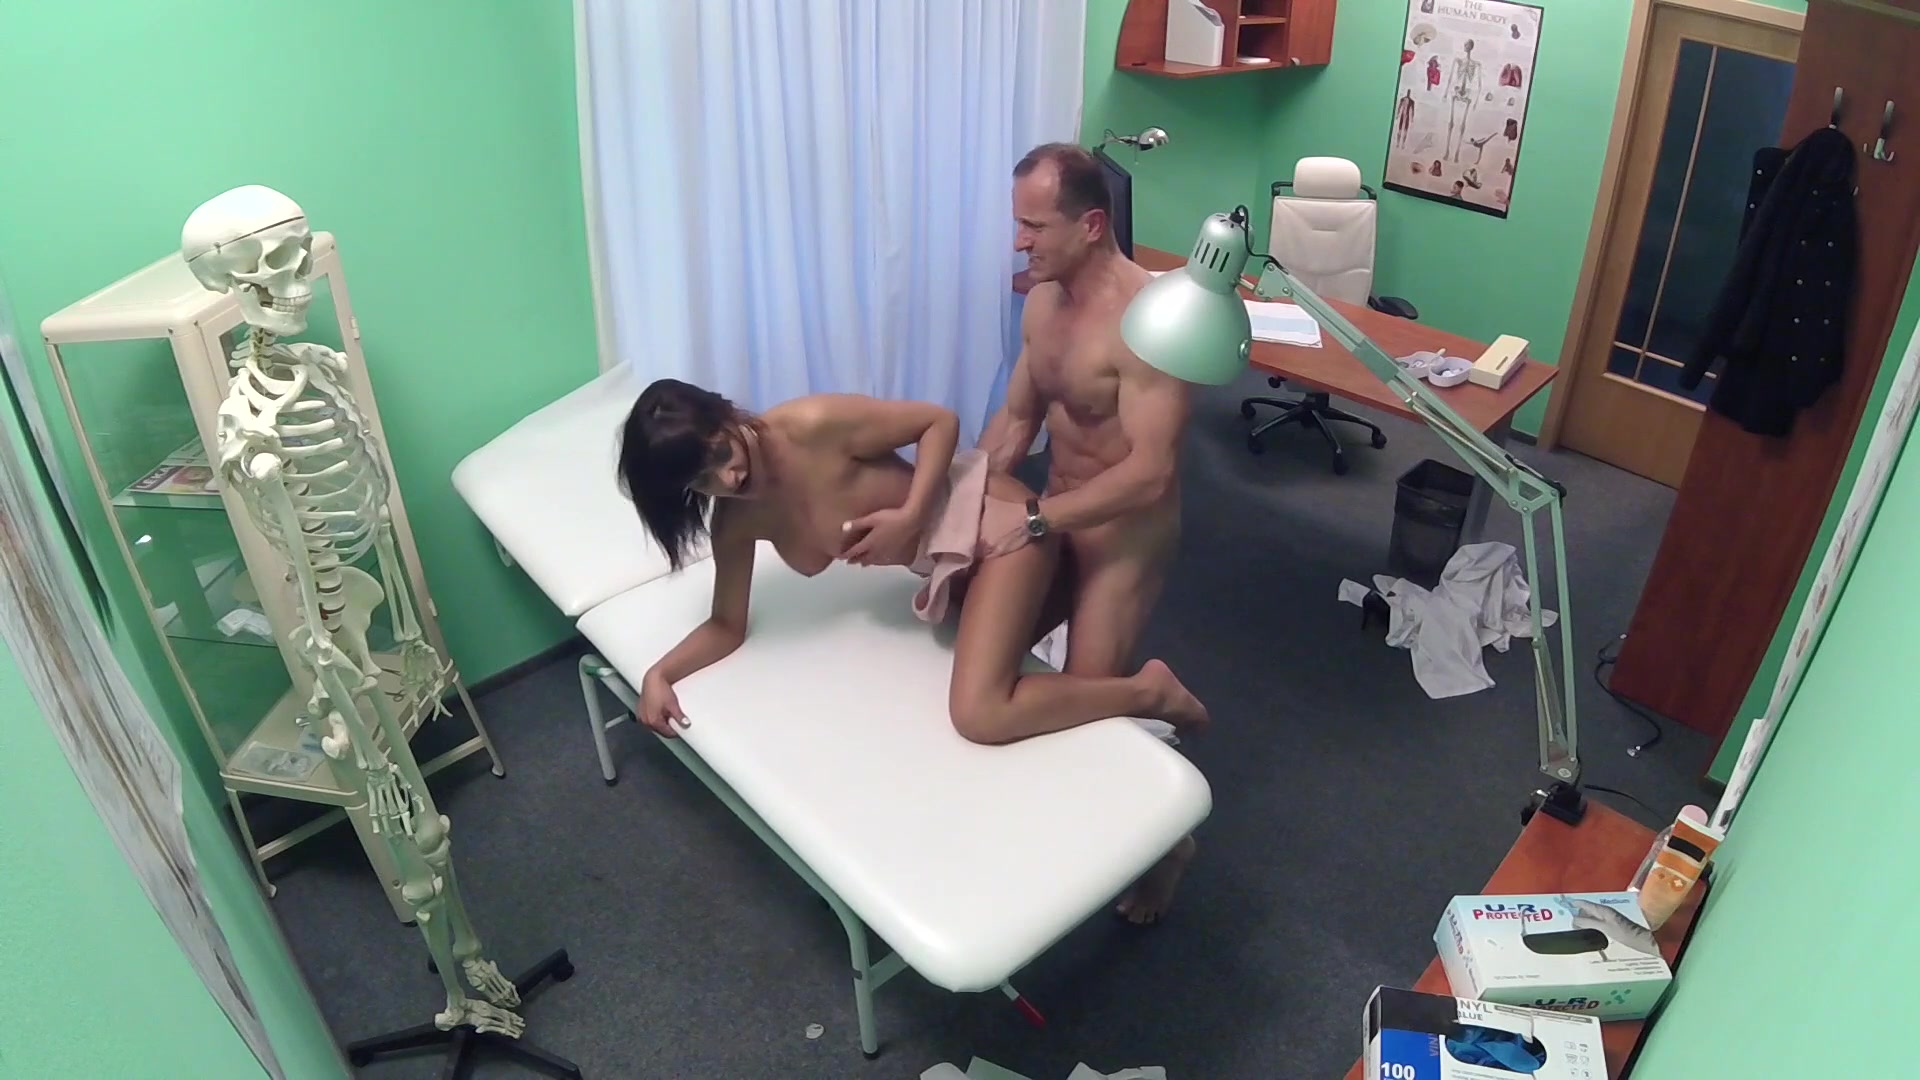 Fake doctor porn pics